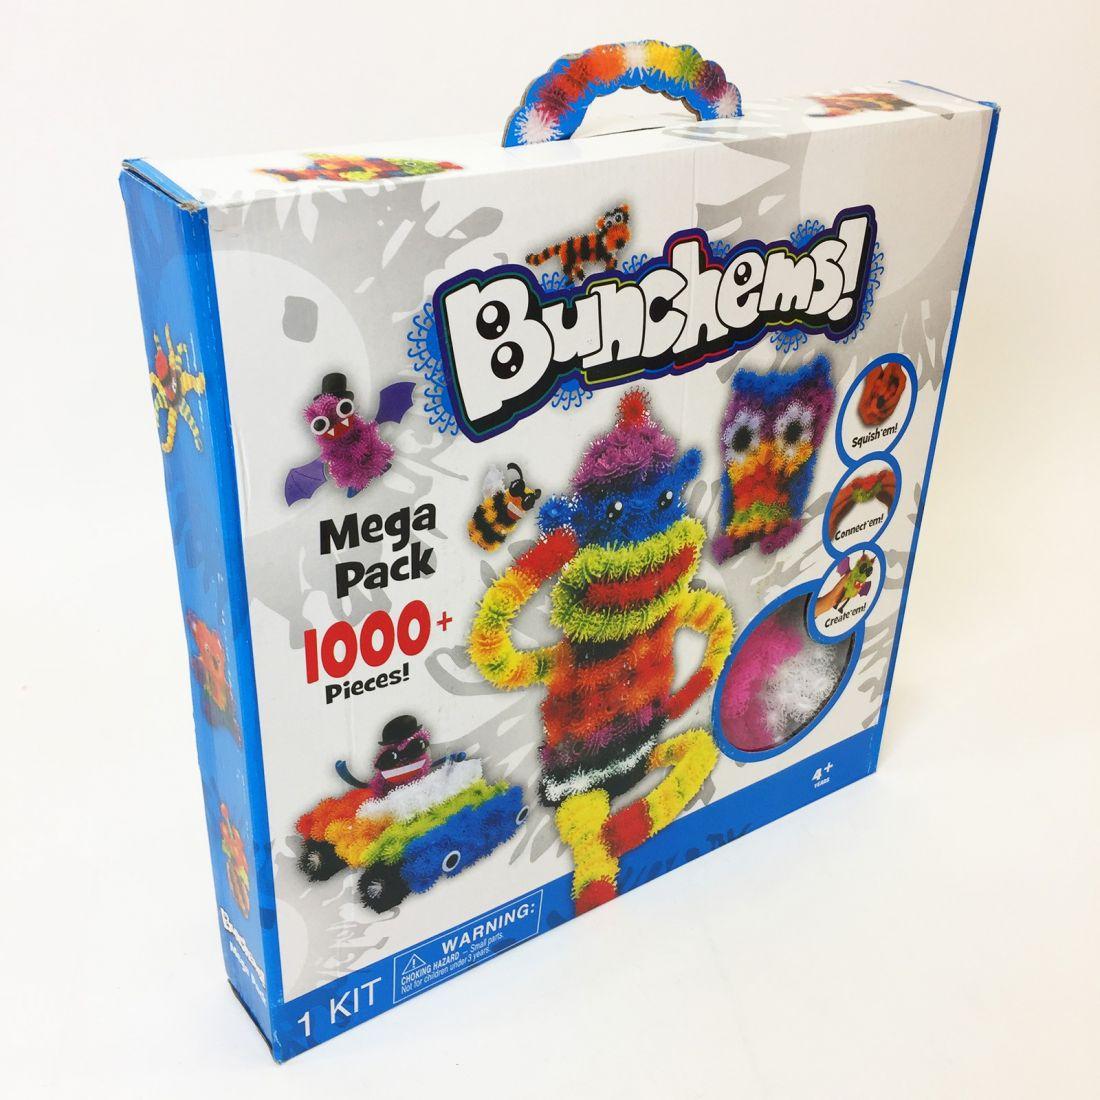 Bunchems MegaPack 1000+